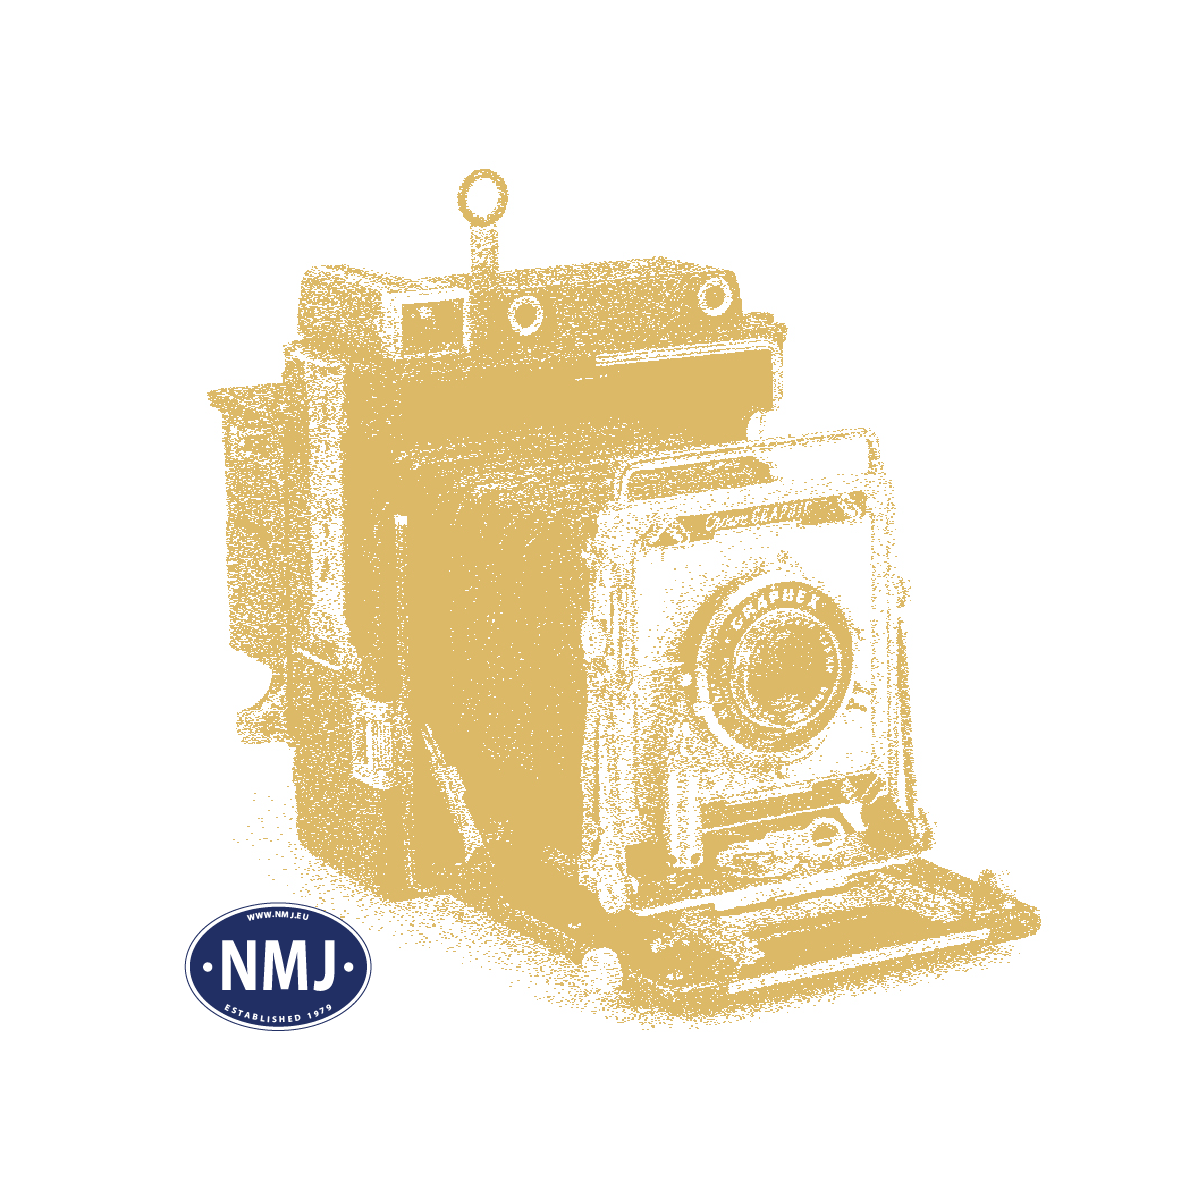 NMJT199.101 - NMJ Topline Bahnreisende sitzend, Set #1